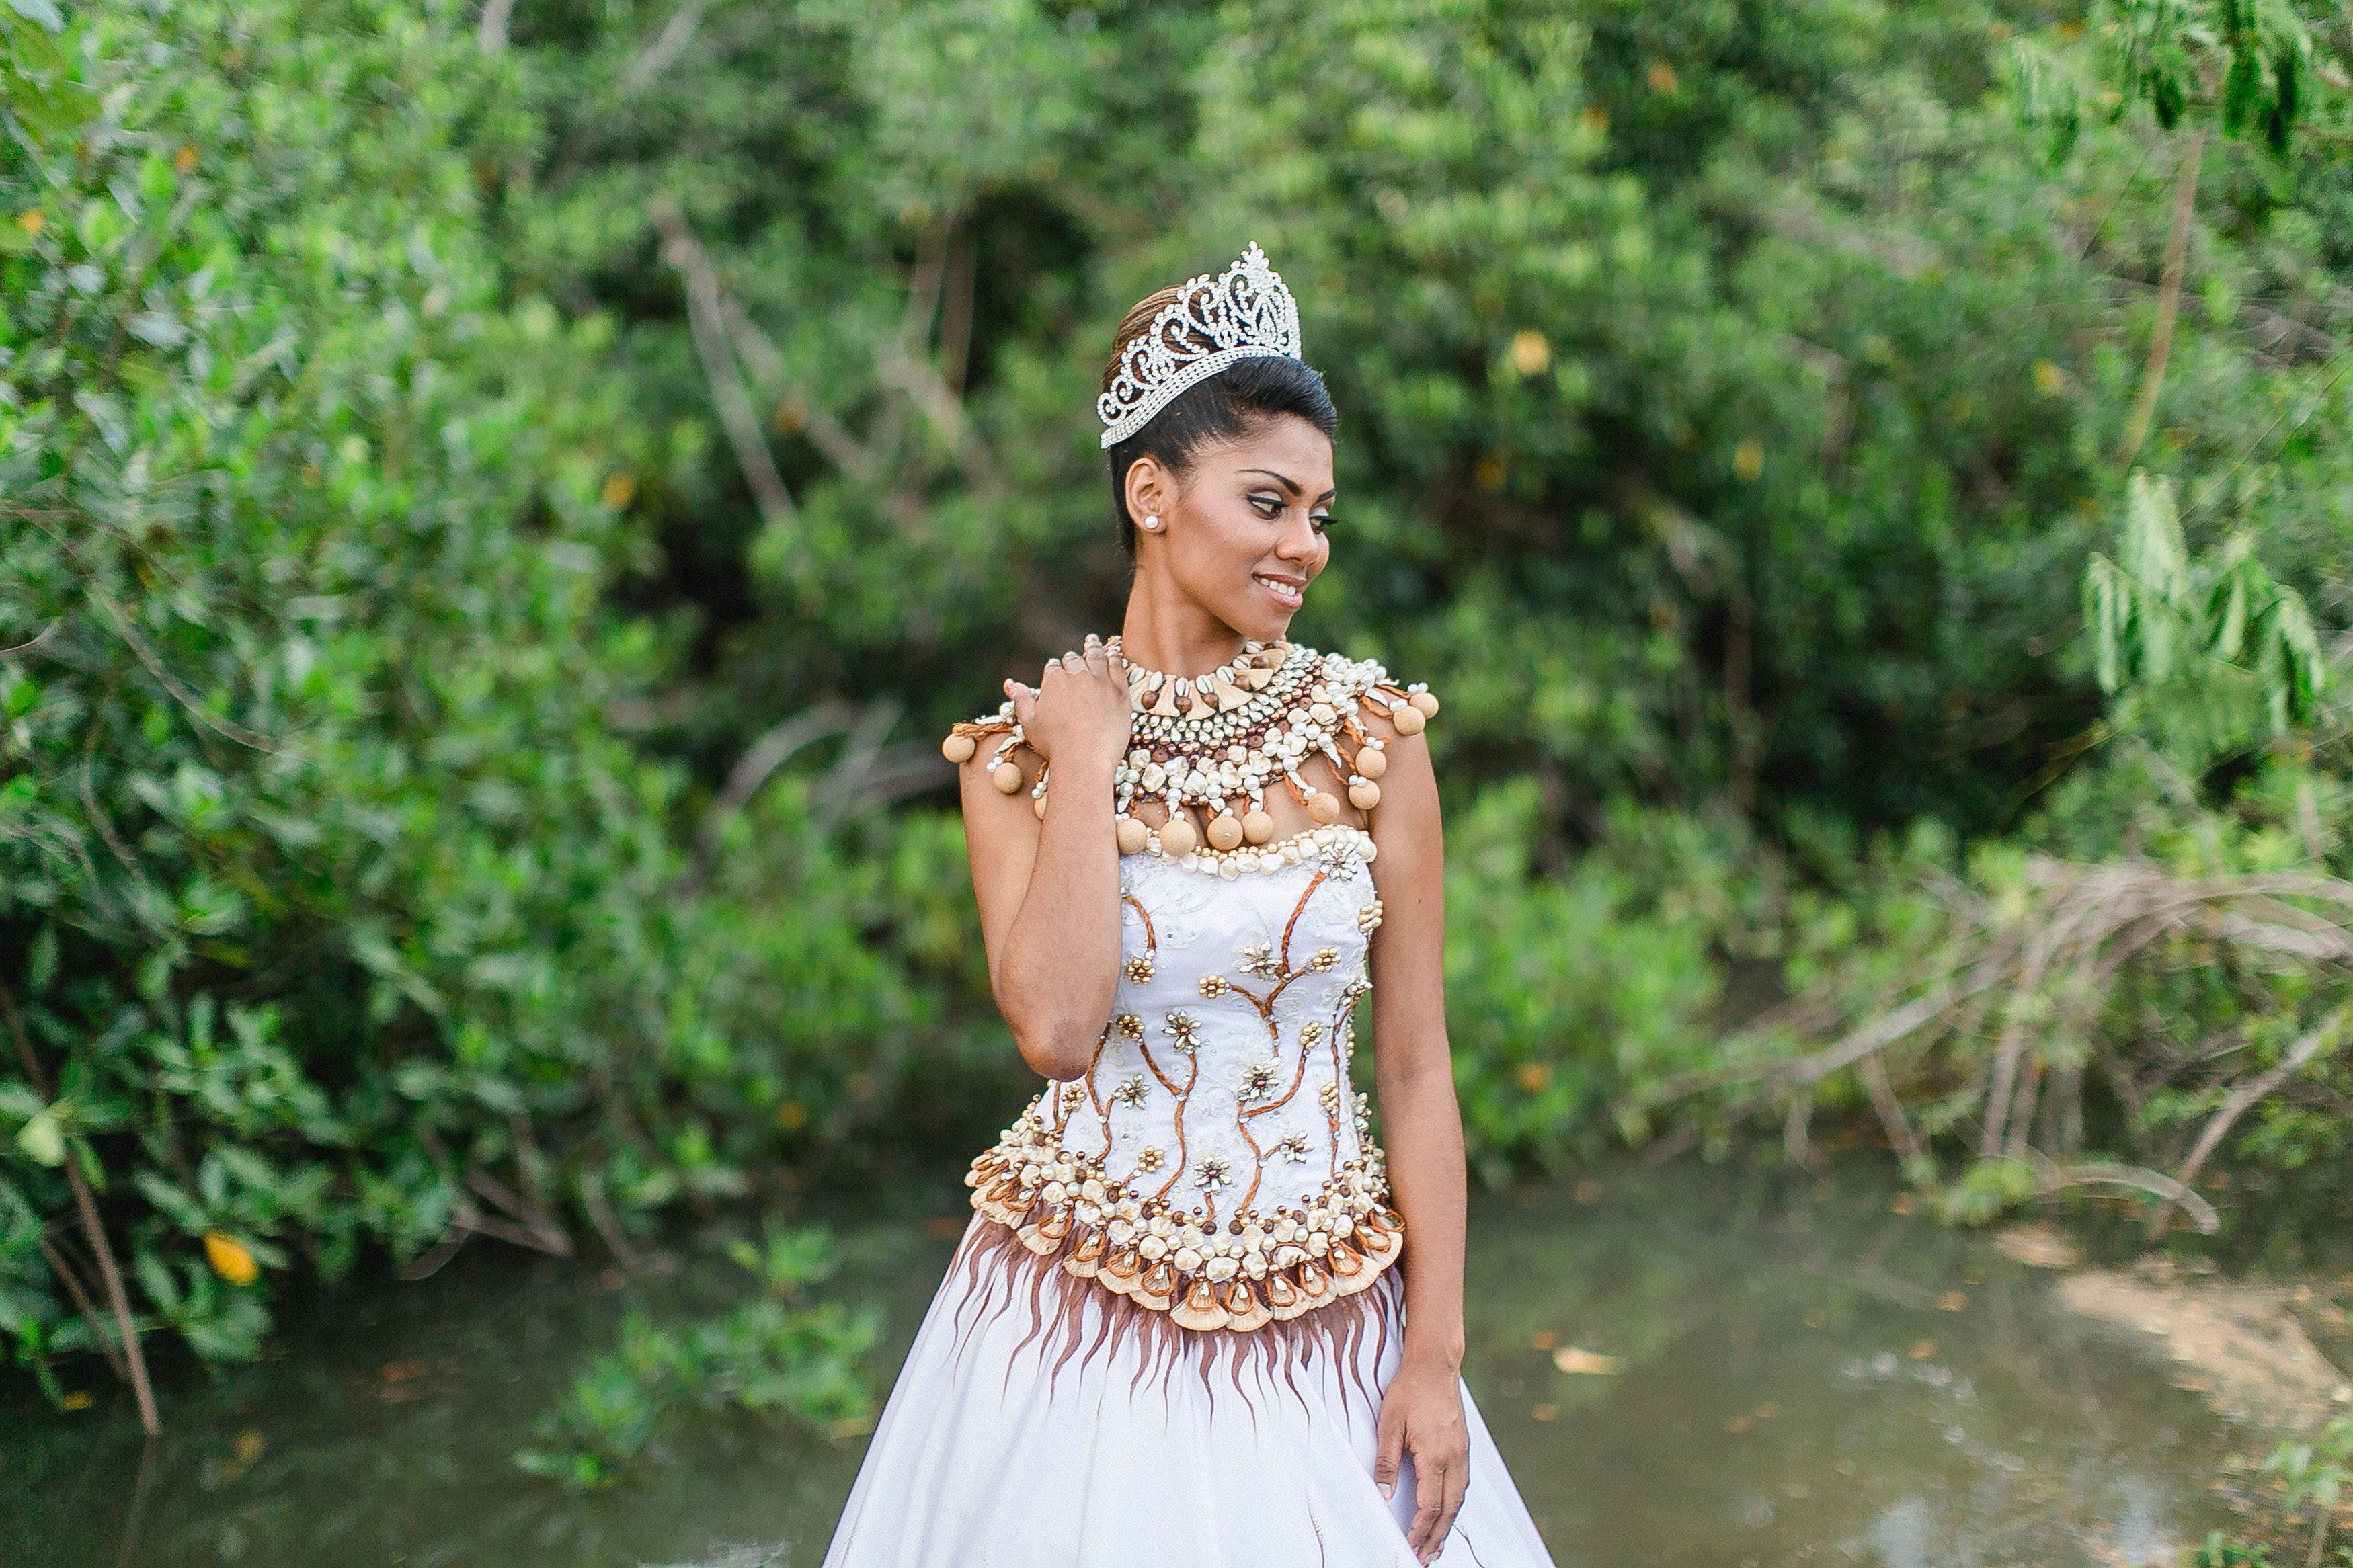 shot by leezett photography. the gown, a blend of itaukei